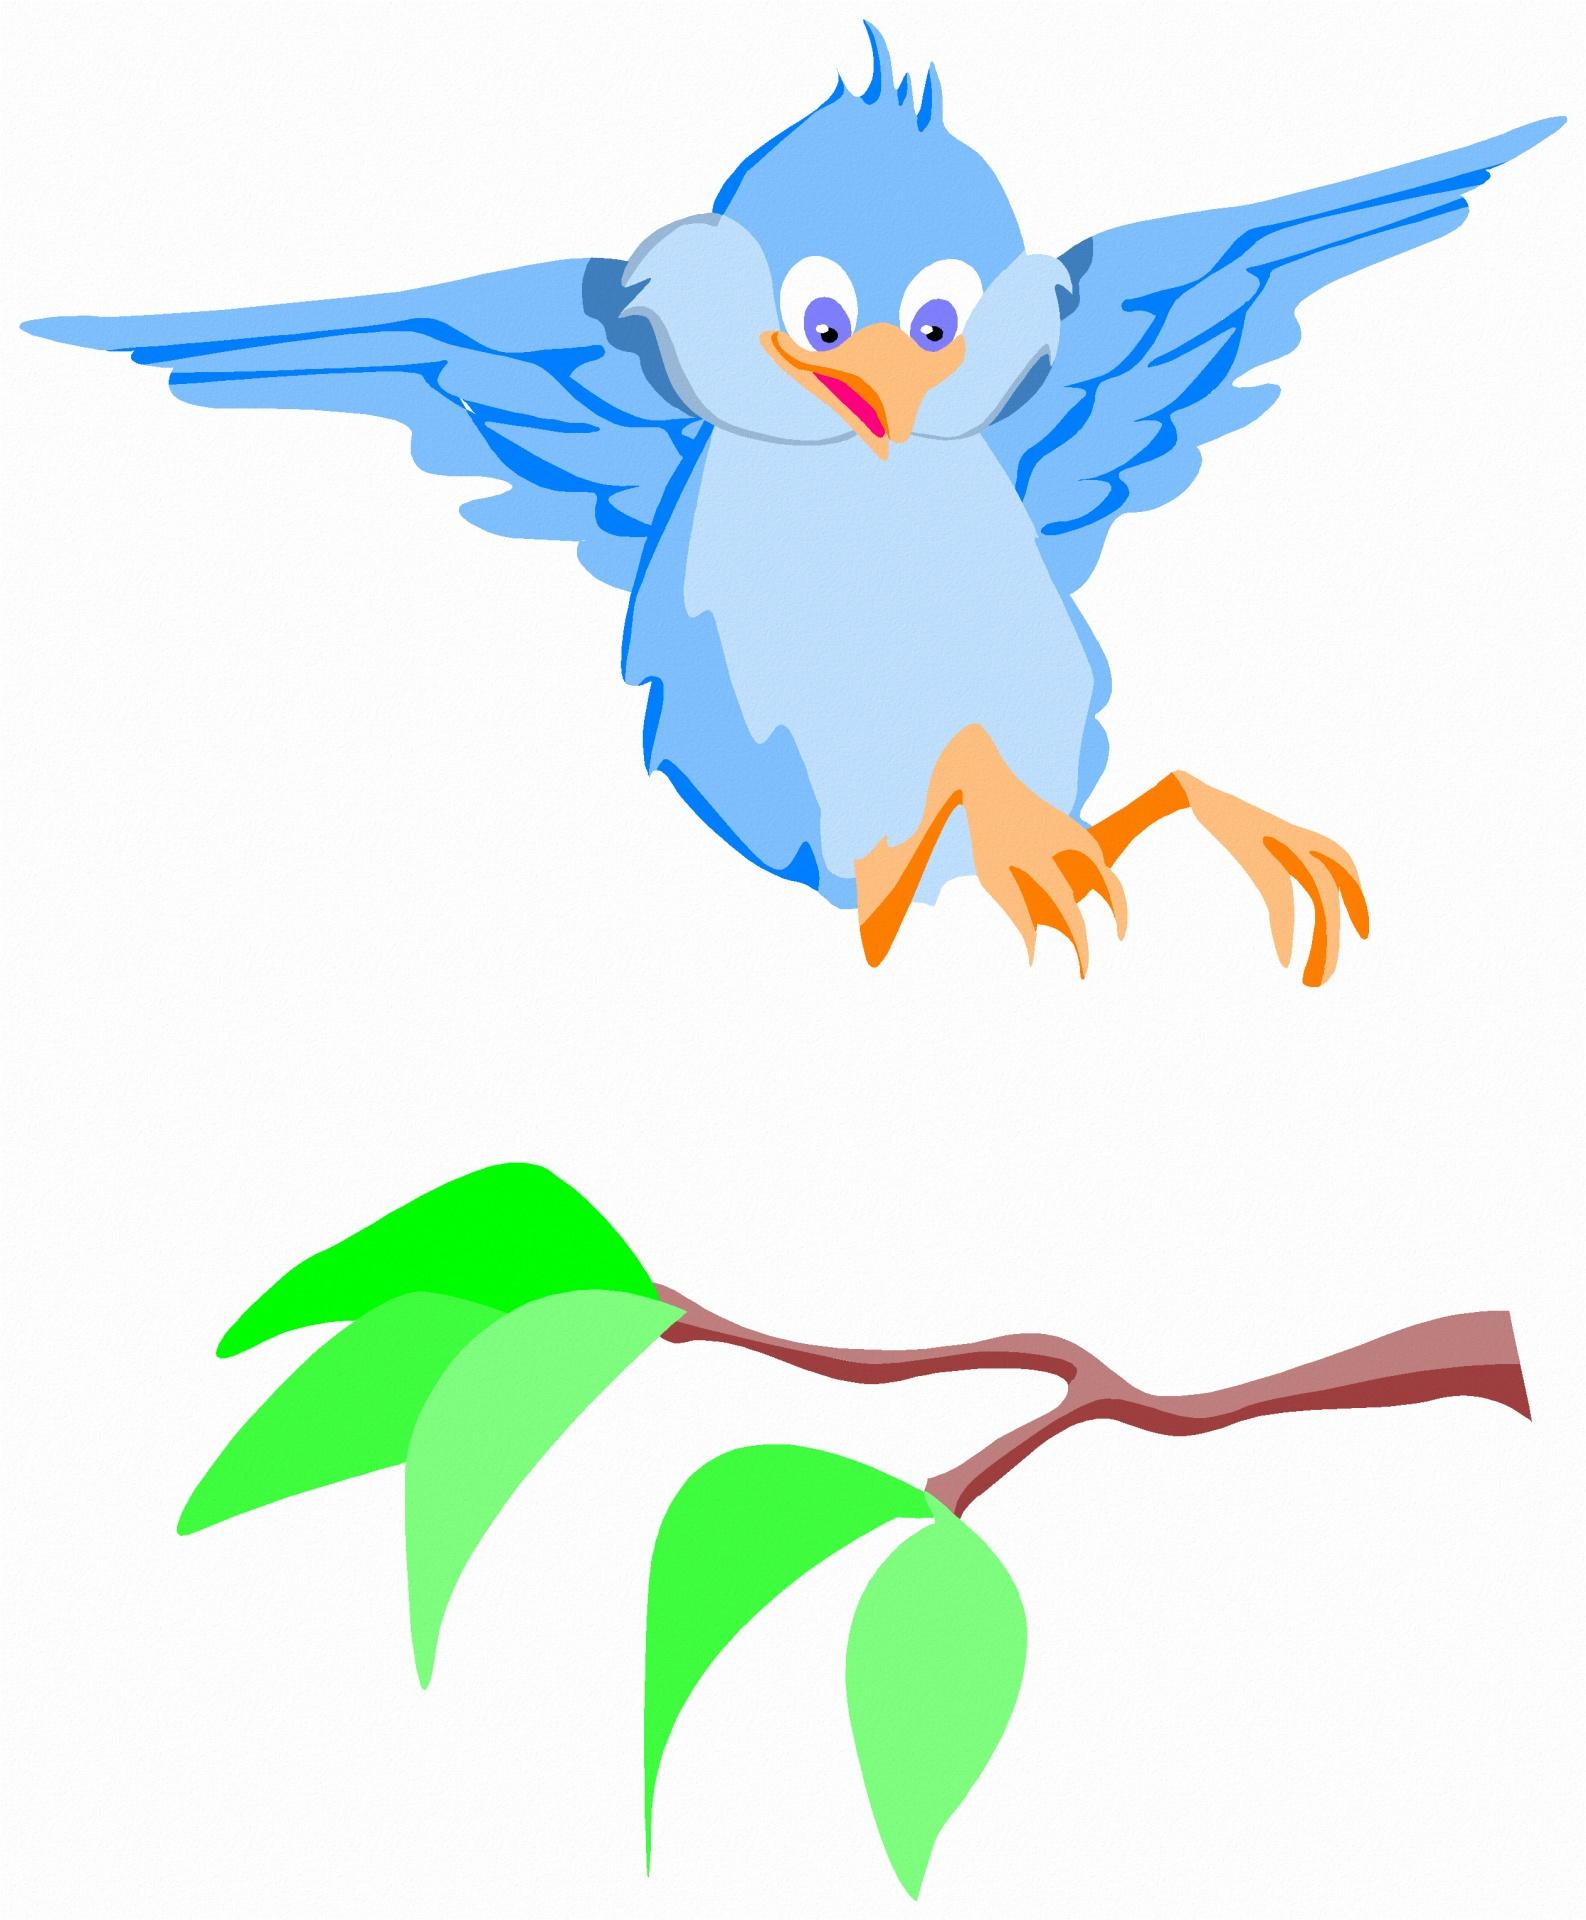 Birdnatureillustrationdrawingexpression Free Photo